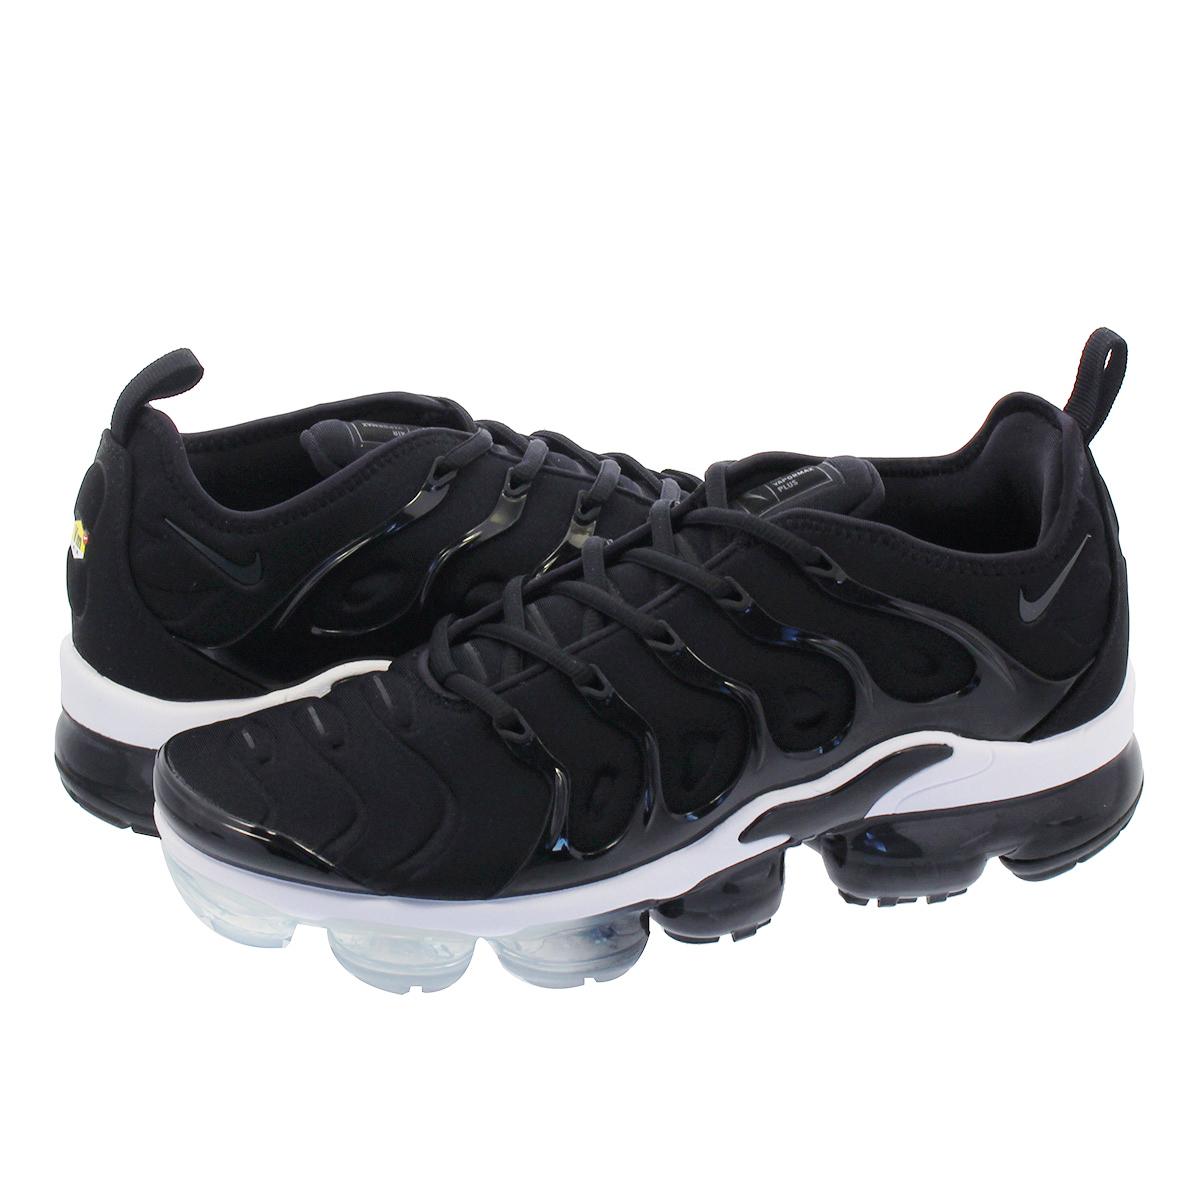 huge discount f2758 bc3df NIKE AIR VAPORMAX PLUS Nike vapor max plus BLACK/ANTHRACITE/WHITE  924,453-010